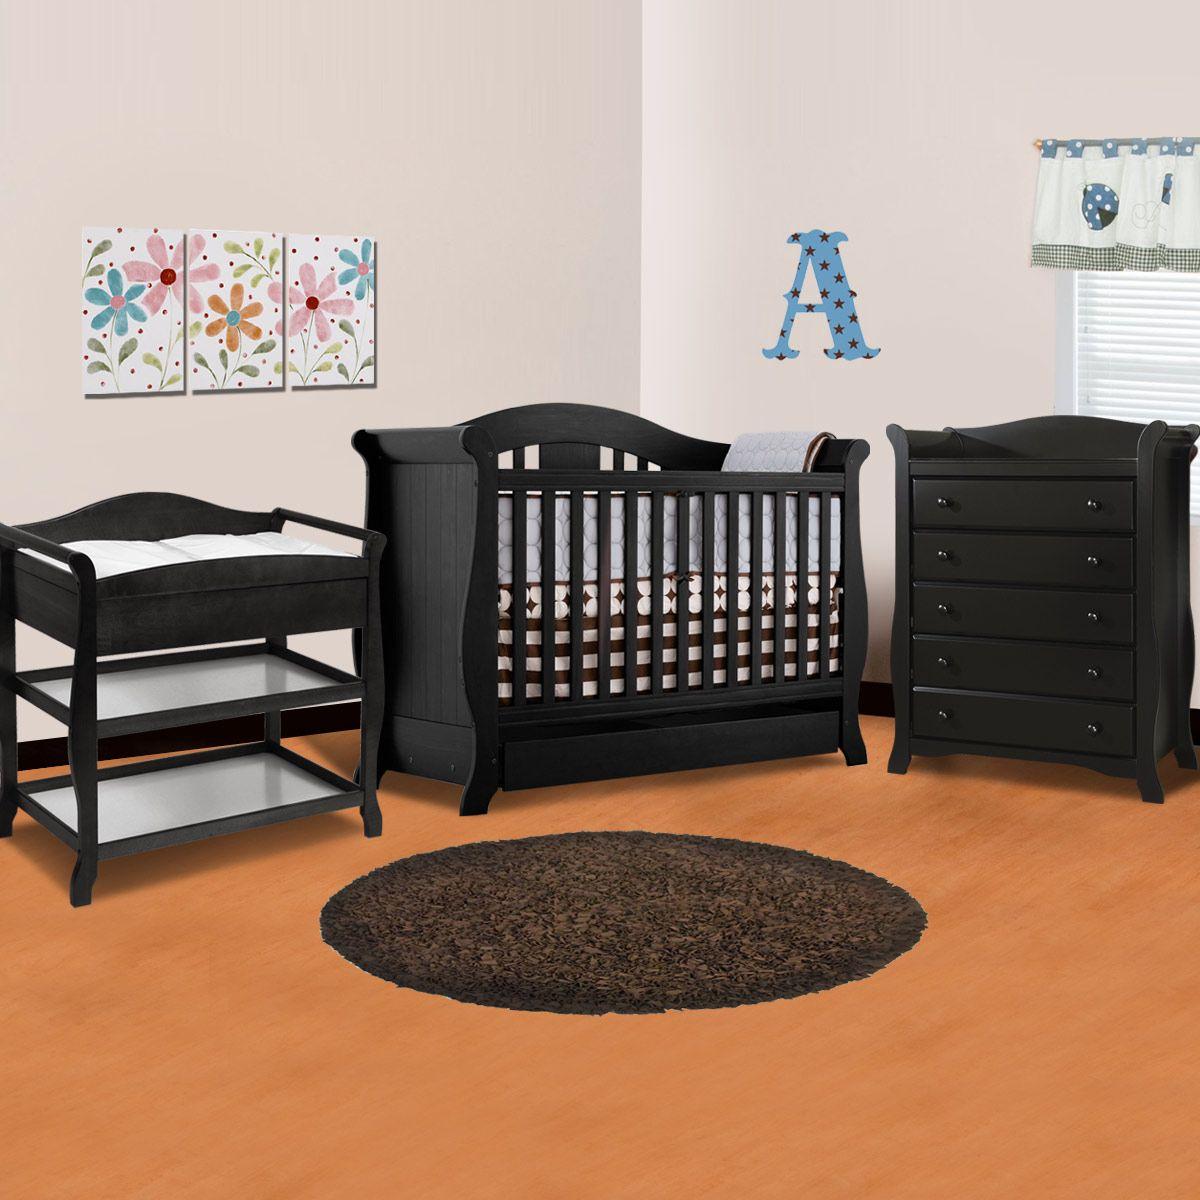 Storkcraft 3 Piece Nursery Set Vittoria Convertible Crib Aspen Changing Table And Avalon 5